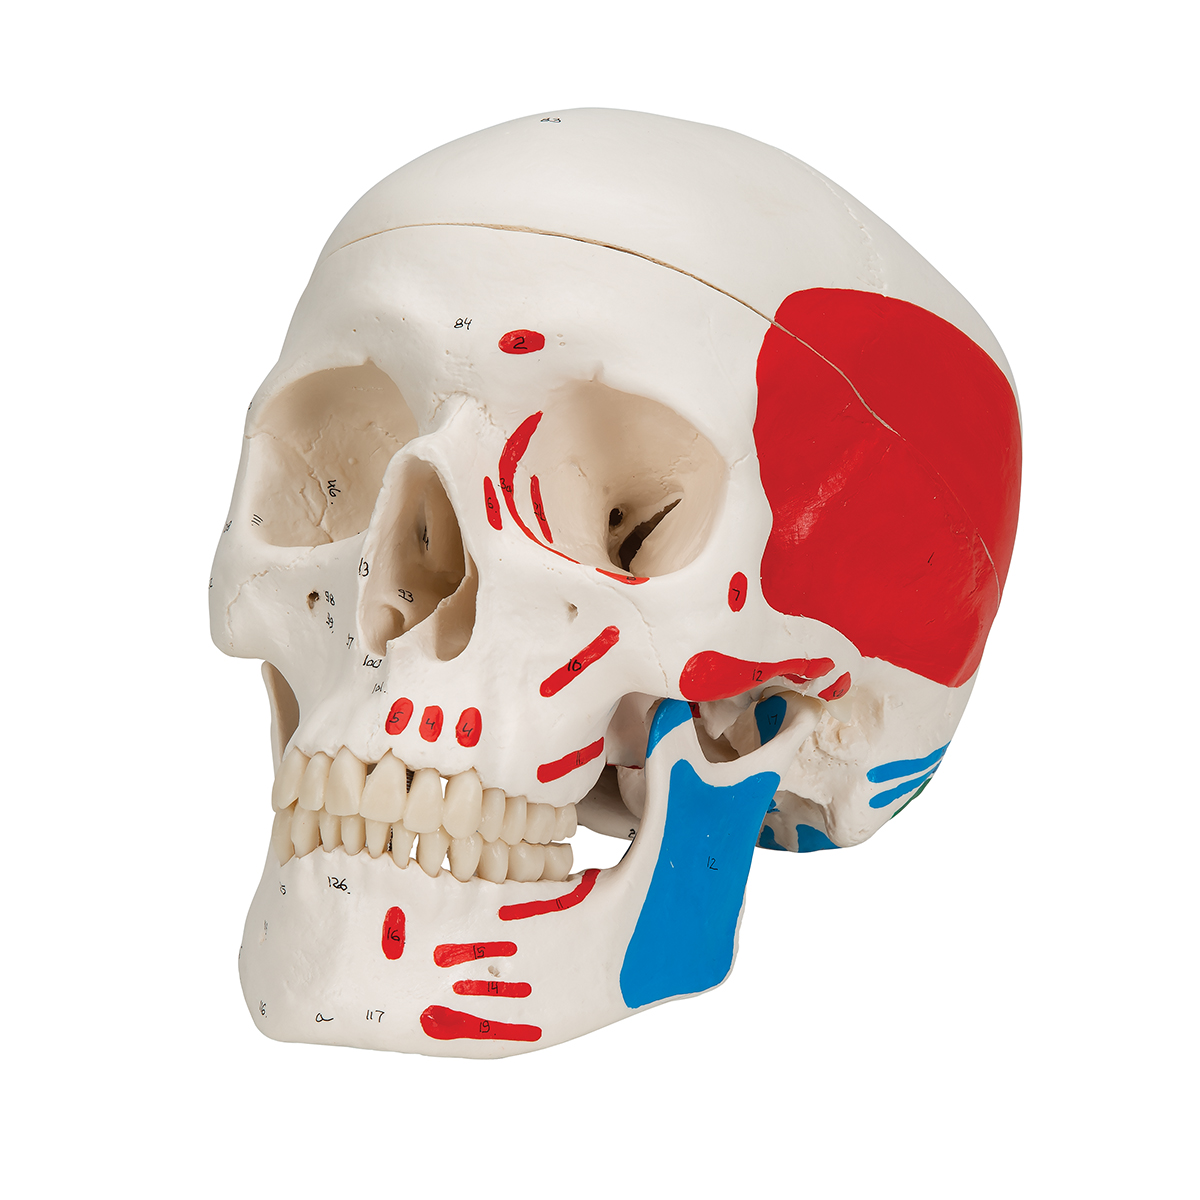 FGA Educational Model Painted Human Skull Model Anatomy Lab Human Skull Model PVC Environmentally Friendly Material Anatomical Model with Base